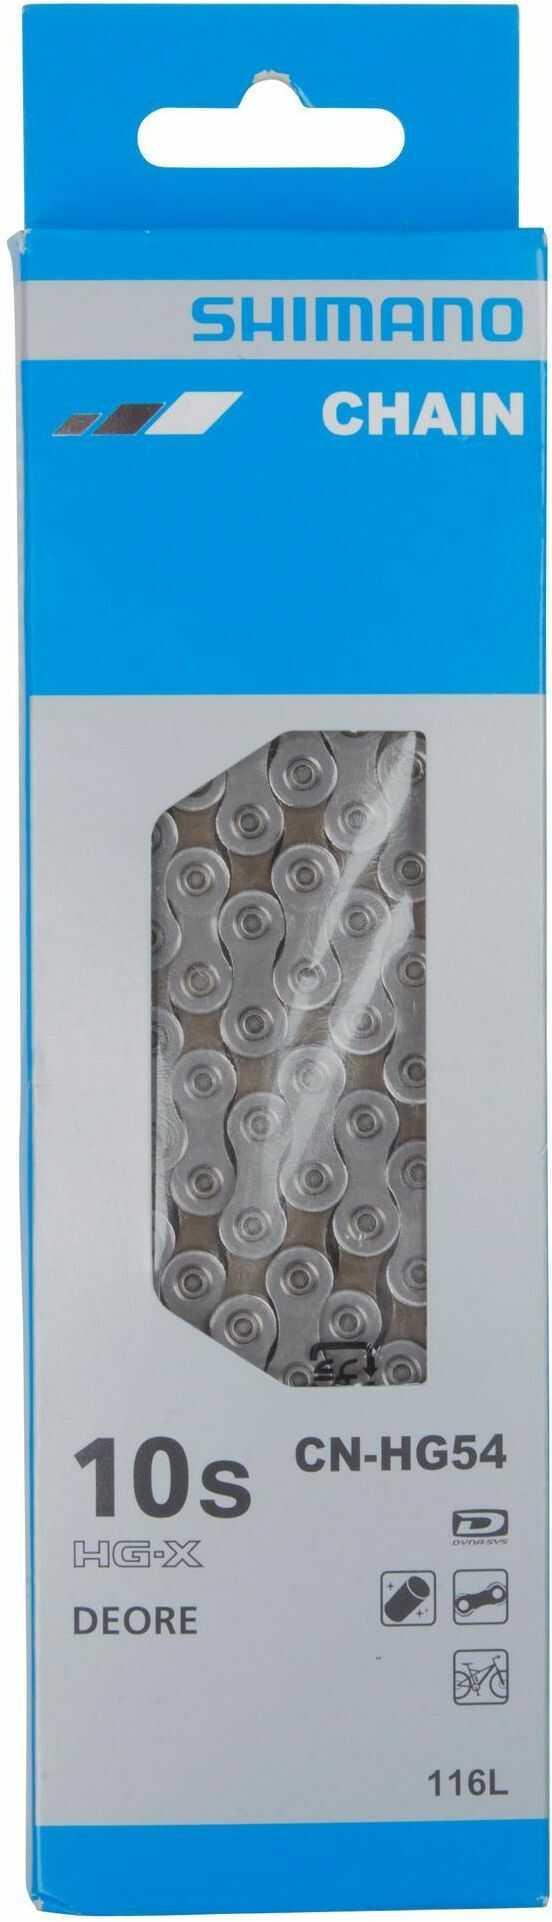 Łańcuch Rowerowy 10-Biegowy Hg54 Deore